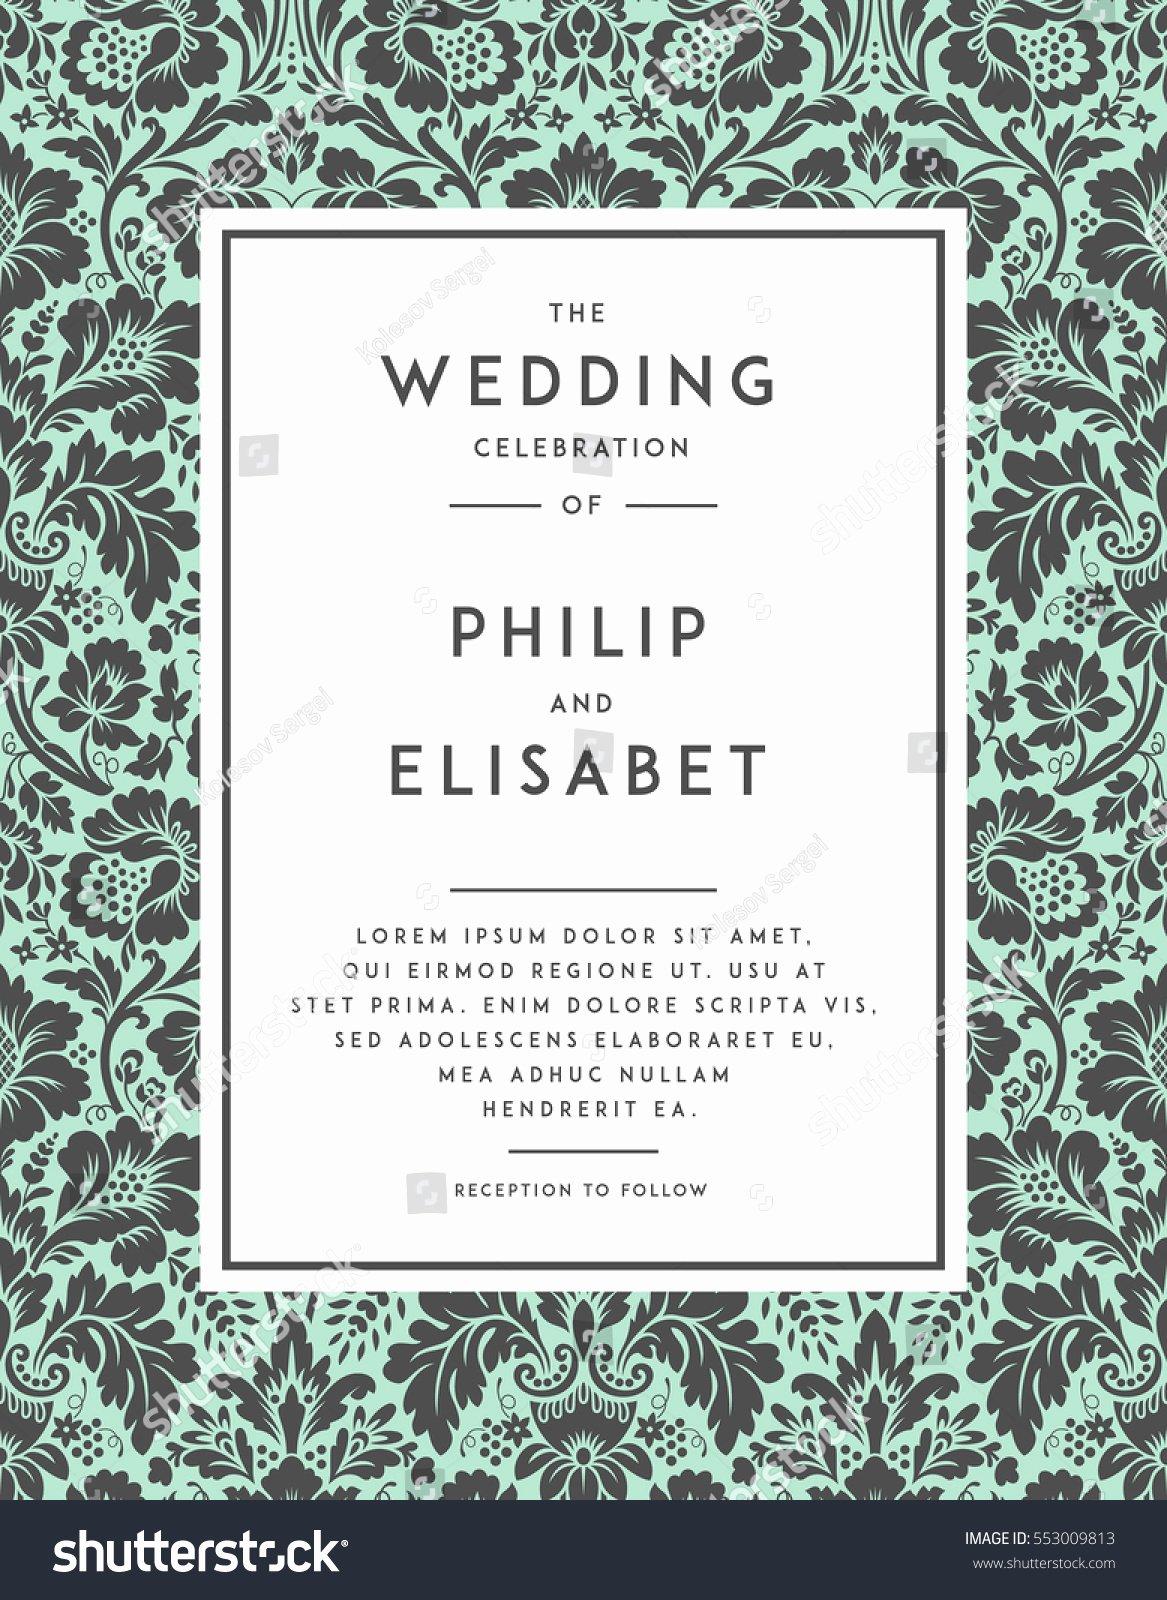 Modern Wedding Invitation Template Beautiful Vintage Wedding Invitation Template Modern Design Stock